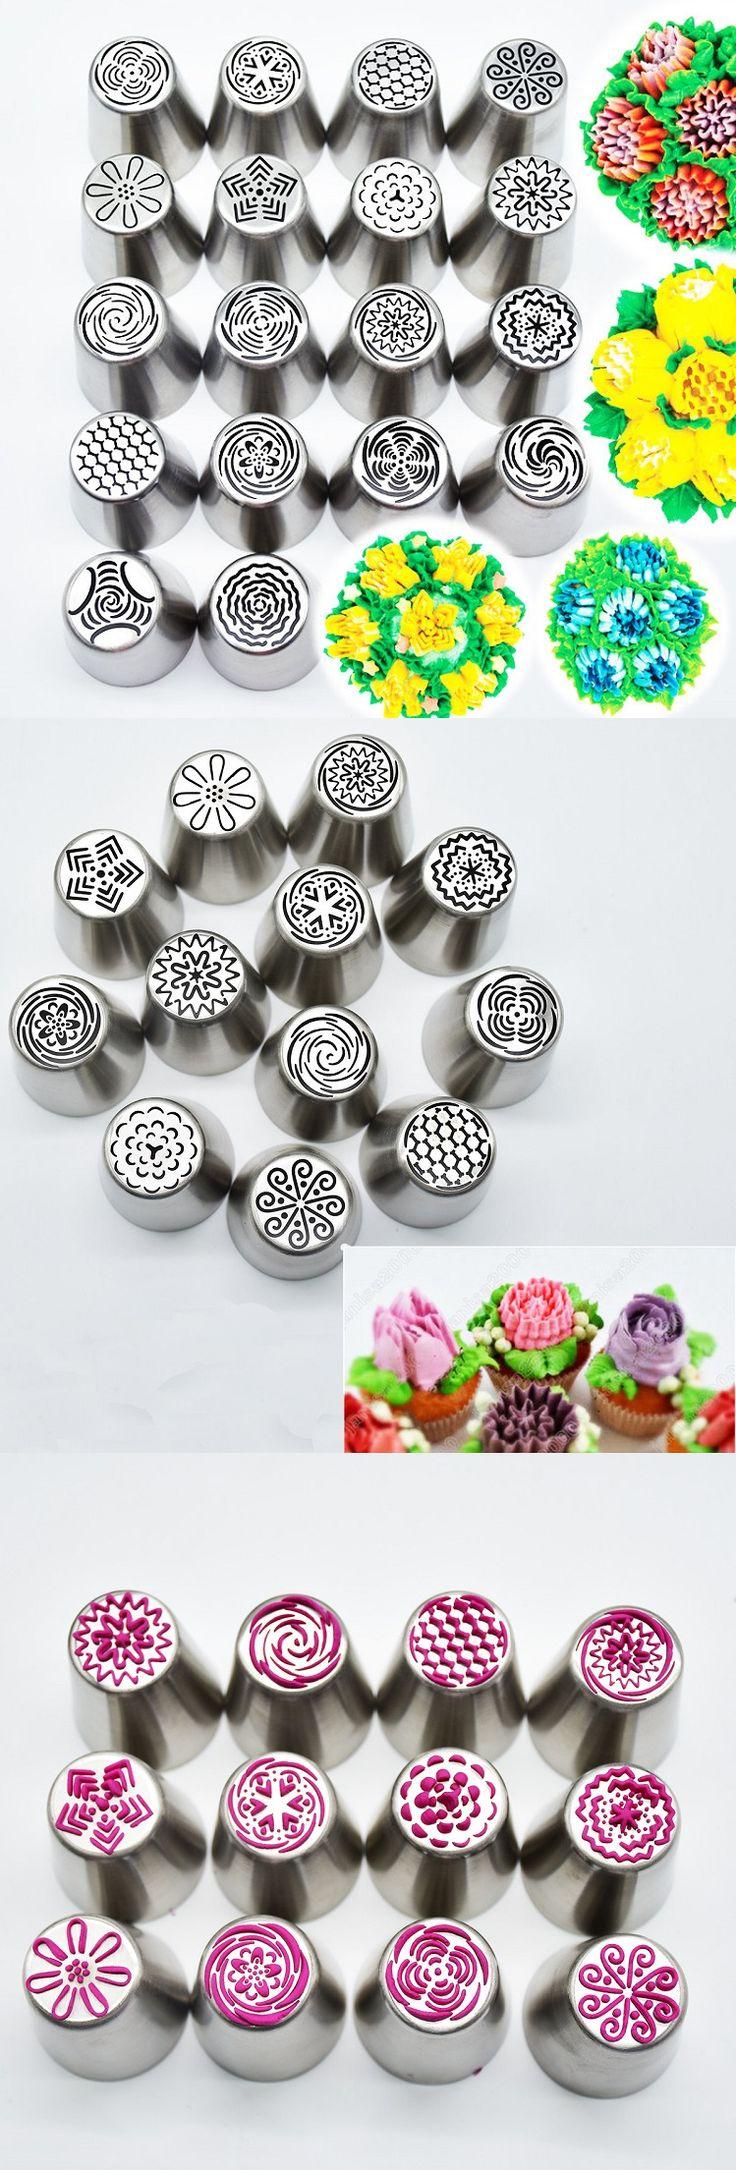 US$16.69 18Pcs DIY Flower Pastry Cake Icing Piping Nozzles Decorating Tips Baking Tools Cupcake Bakeware